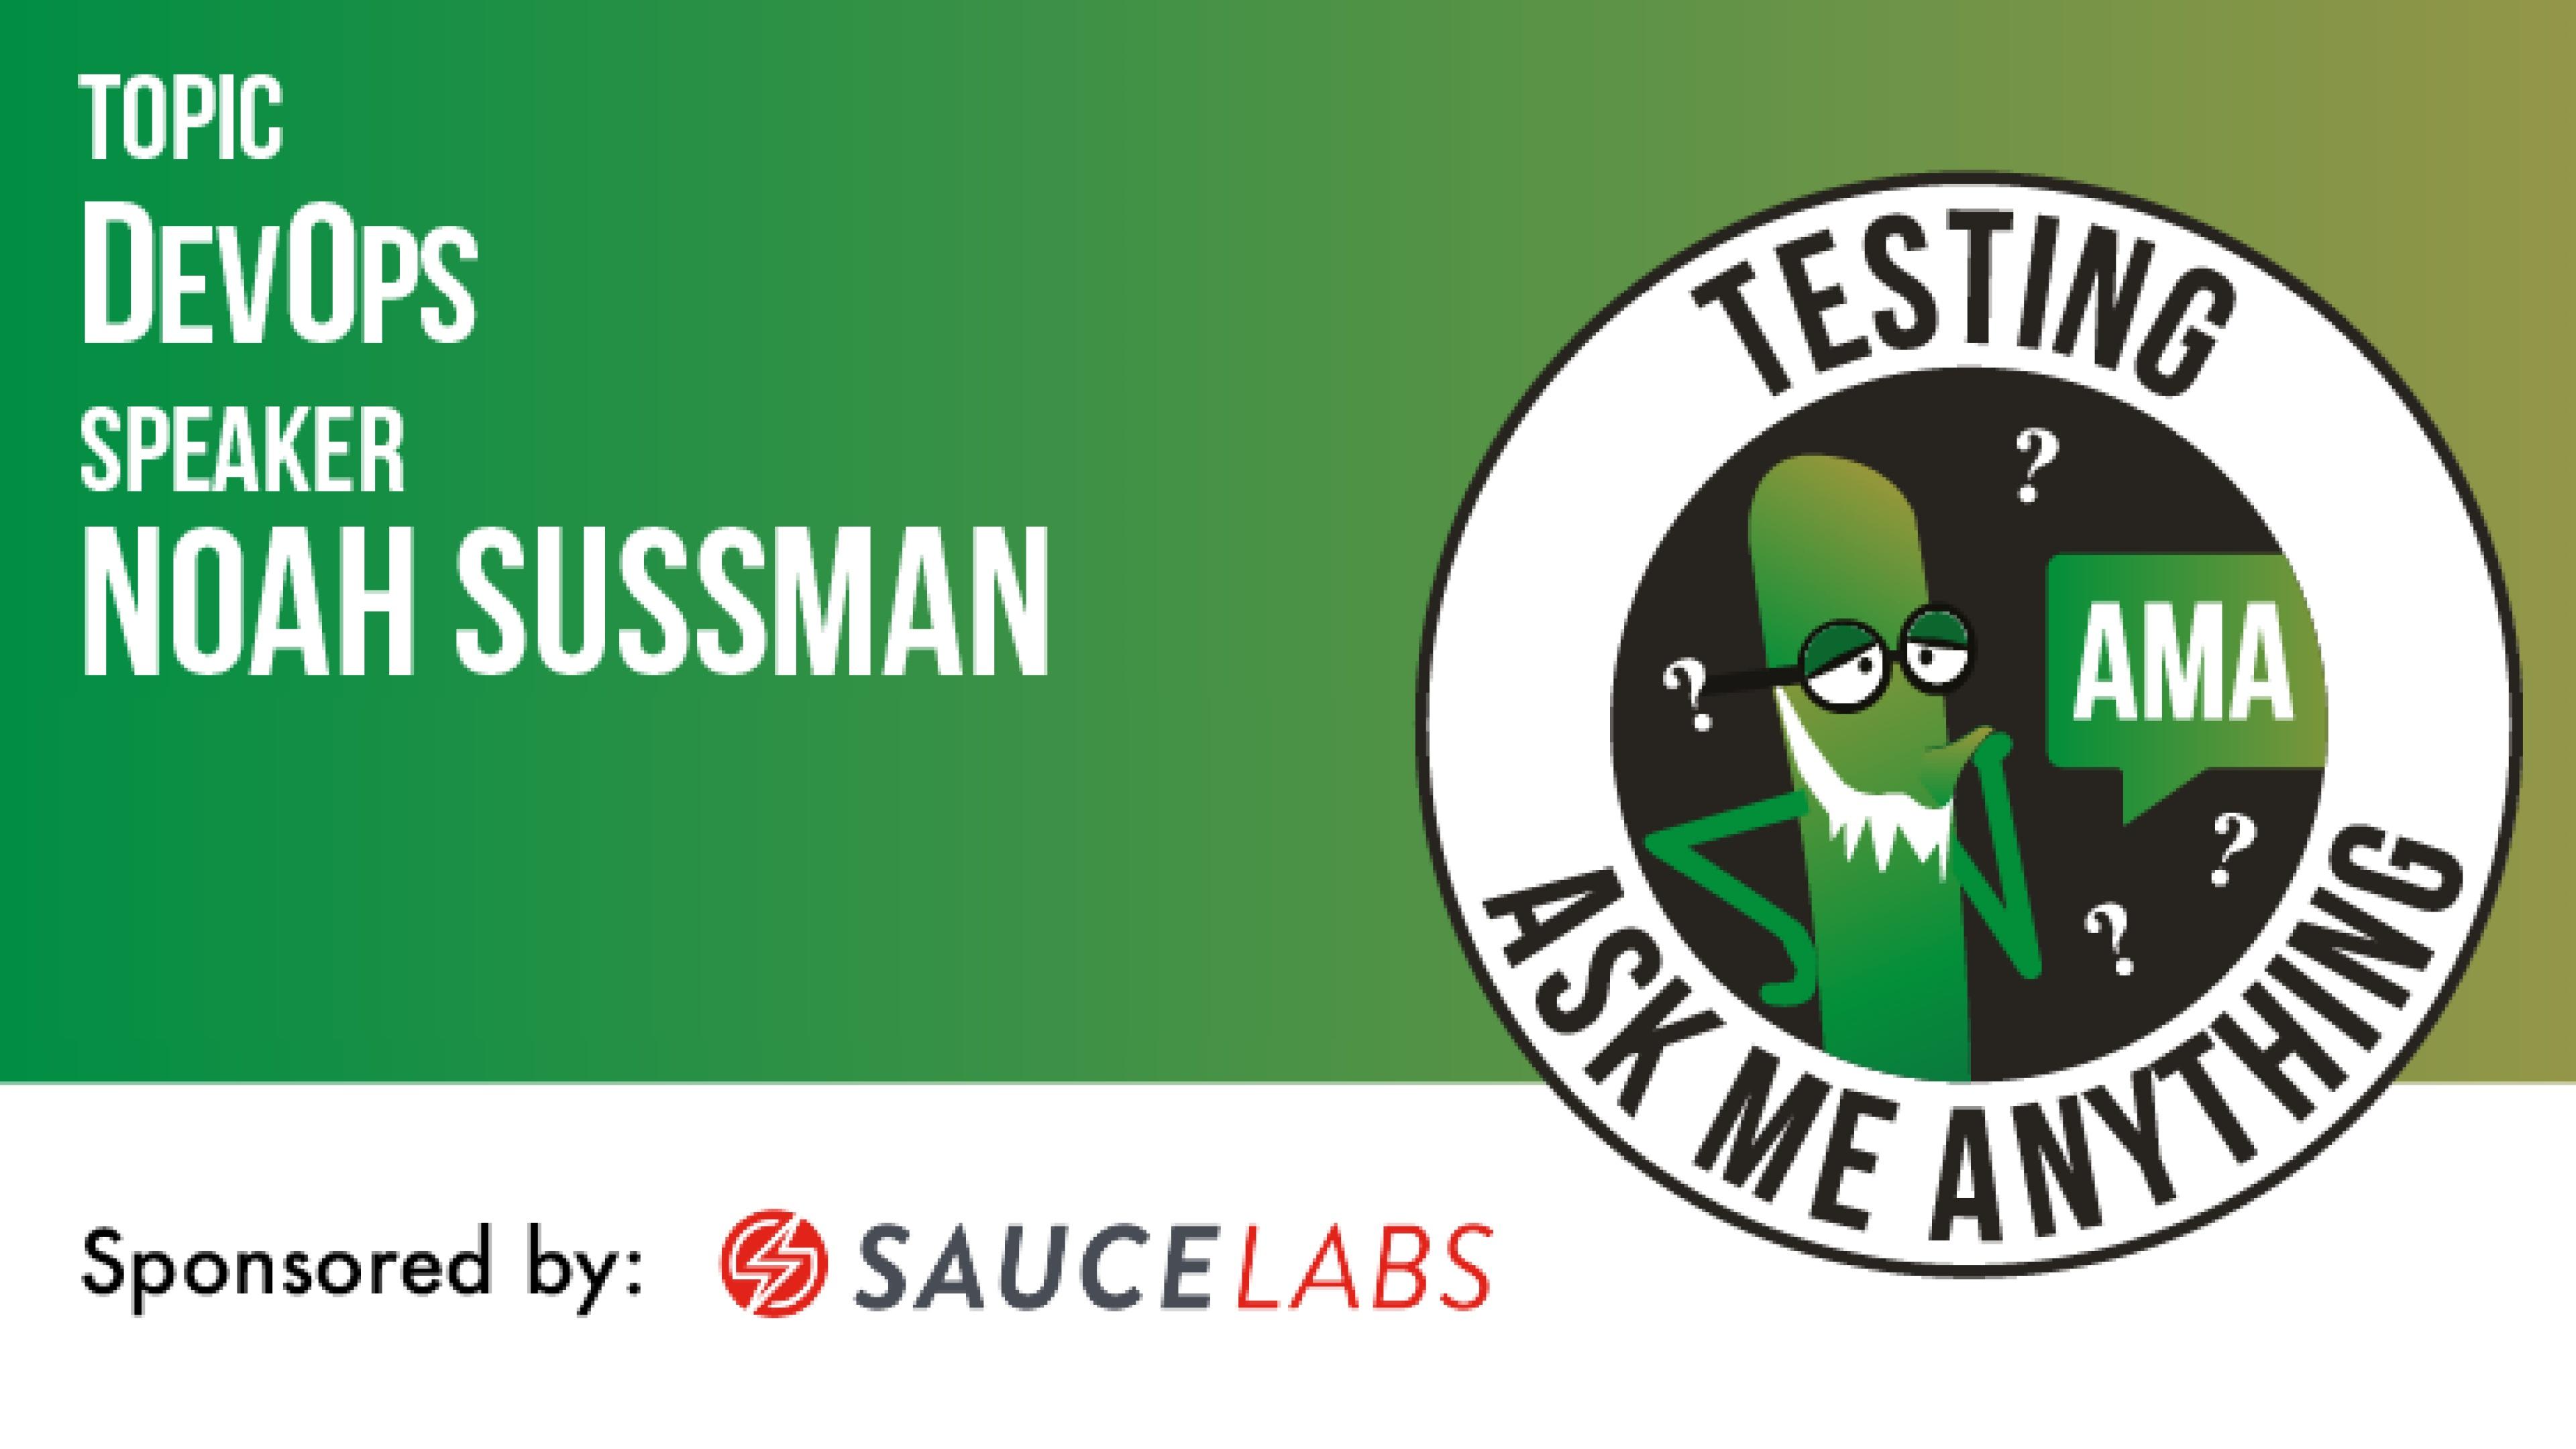 Testing Ask Me Anything - DevOps - Noah Sussman